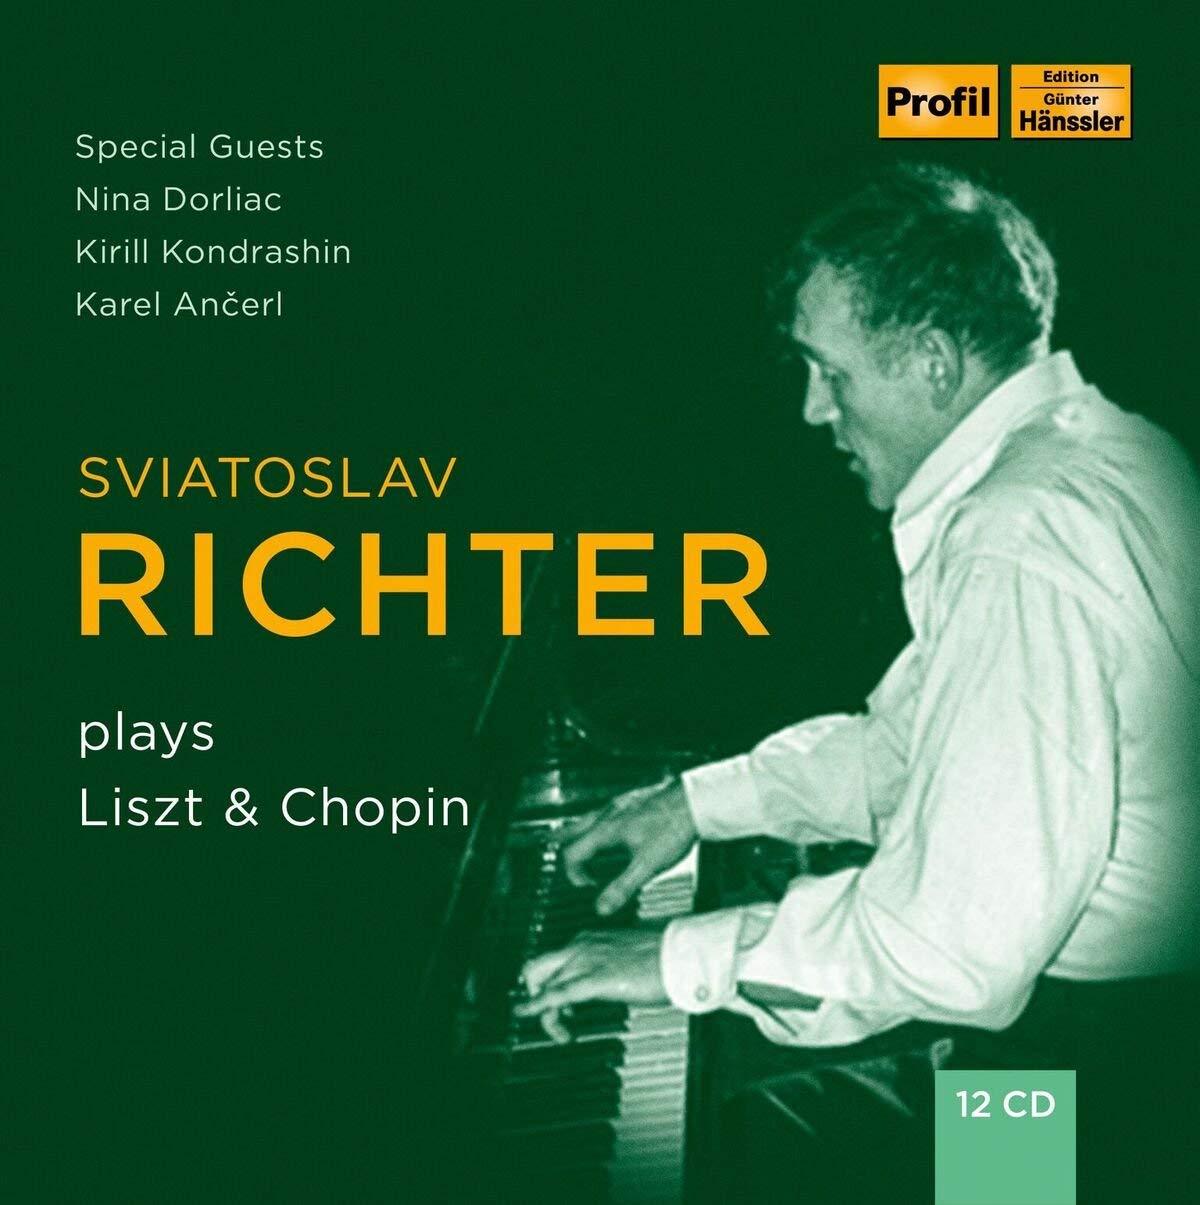 CD : SVIATOSLAV RICHTER - Sviatoslav Richter Plays Liszt & Chopin (12PC)